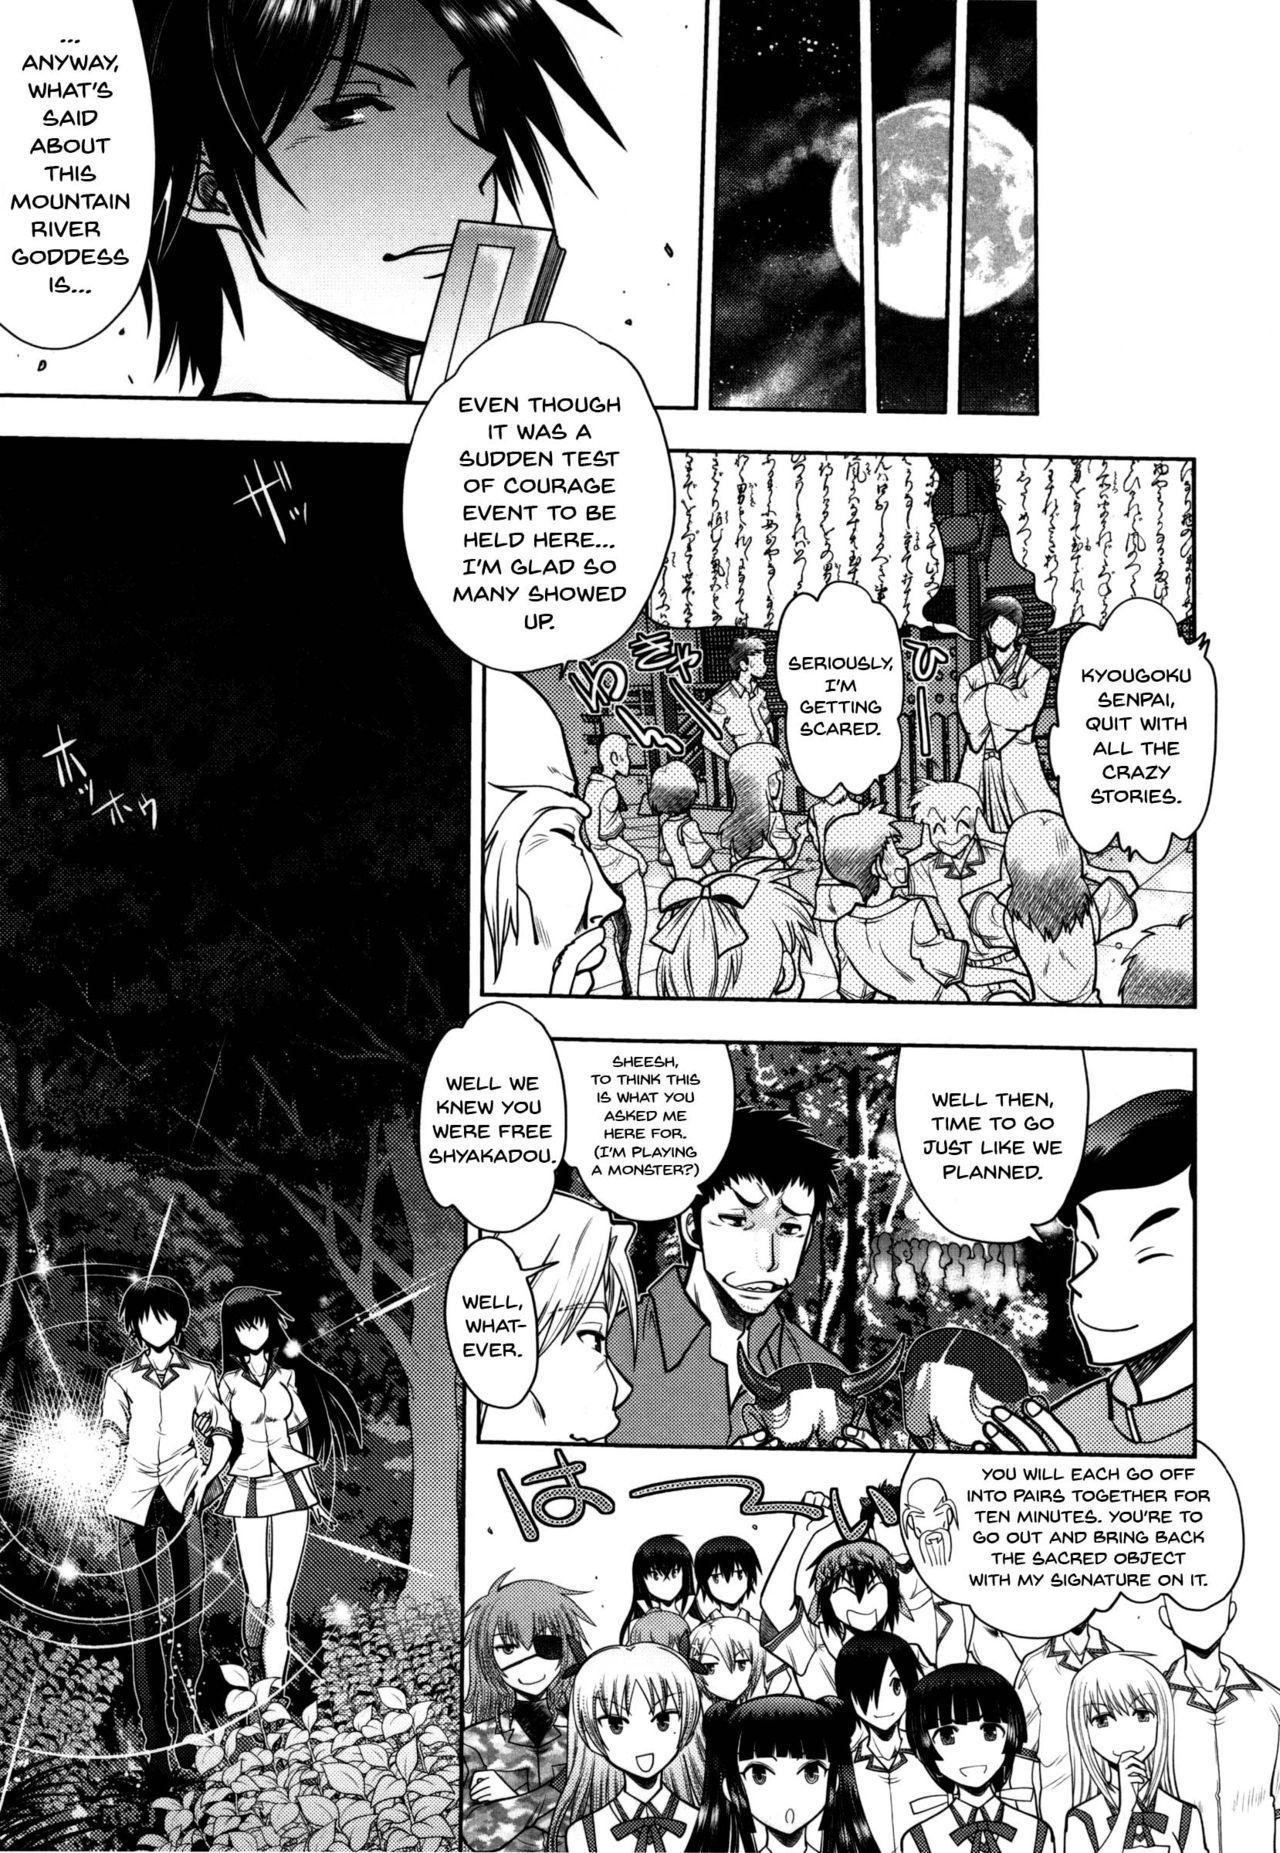 [Yagami Dai] Maji de Watashi ni Koi Shinasai! S Adult Edition ~Shodai Heroine Hen~ | Fall in Love With Me For Real! Ch.1-6 [English] {Doujins.com} 7